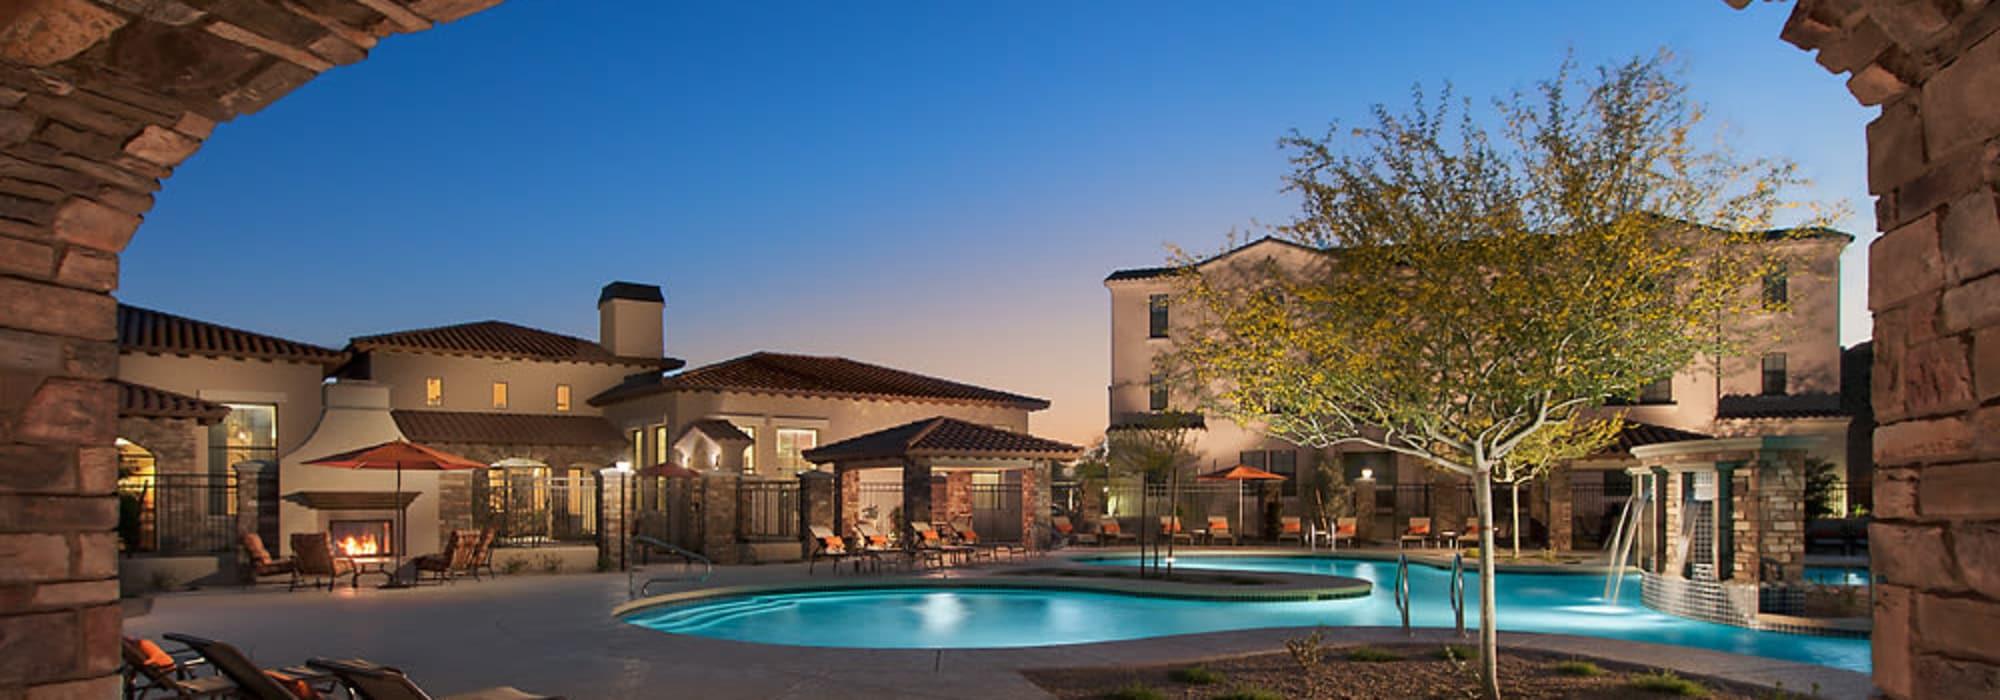 Poolside lounge chairs at San Norterra in Phoenix, Arizona